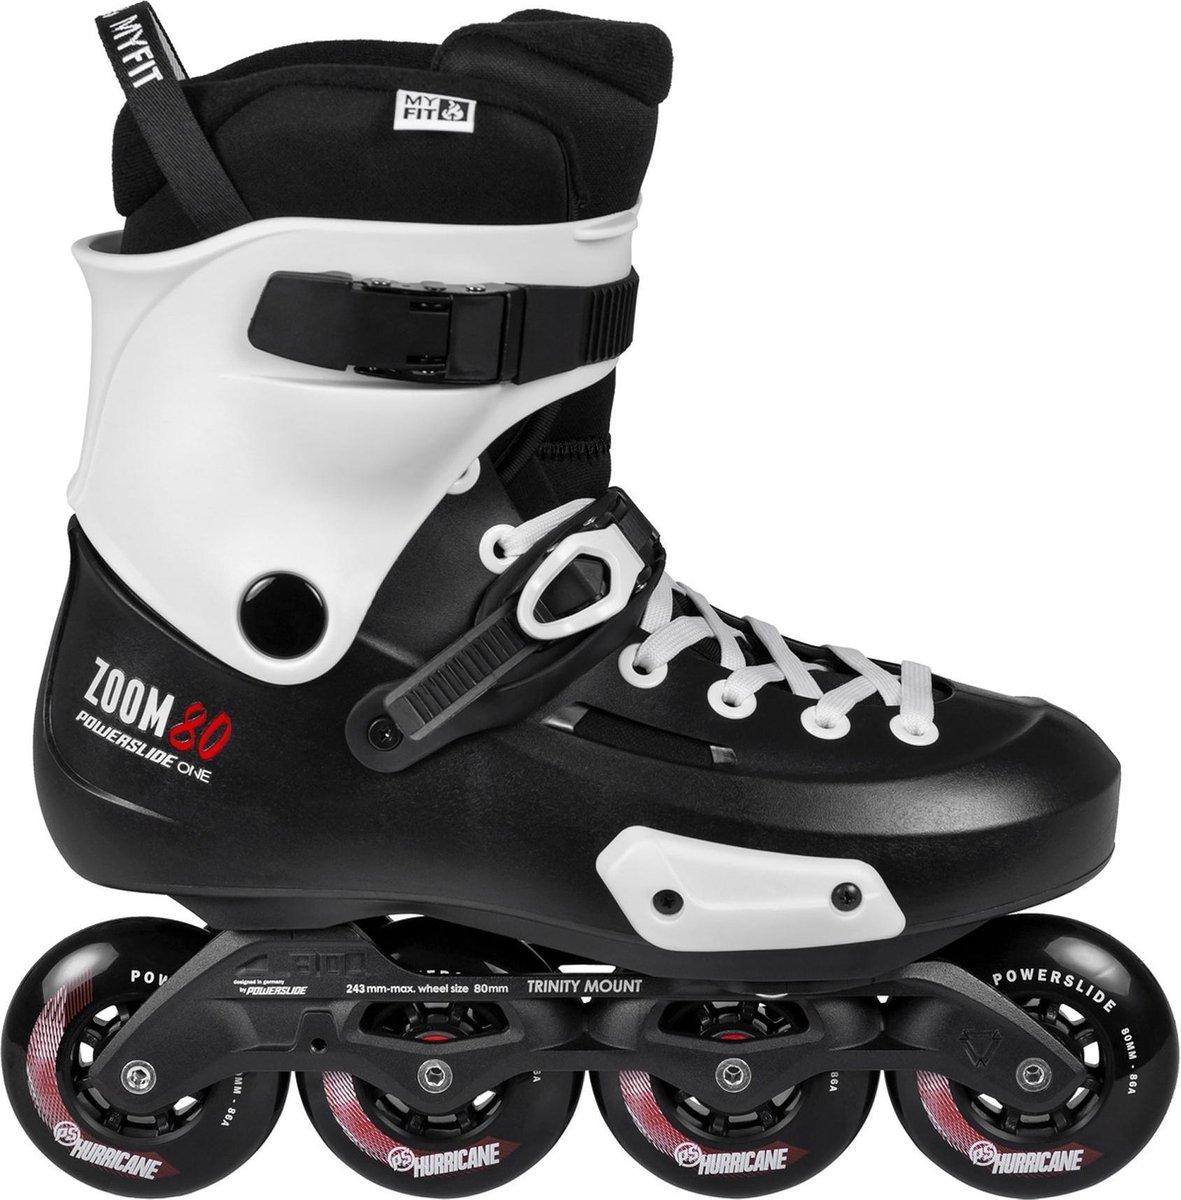 Powerslide One Zoom 80 Inline Skate Senior Inlineskates - Maat 43/44 - Unisex - zwart/wit